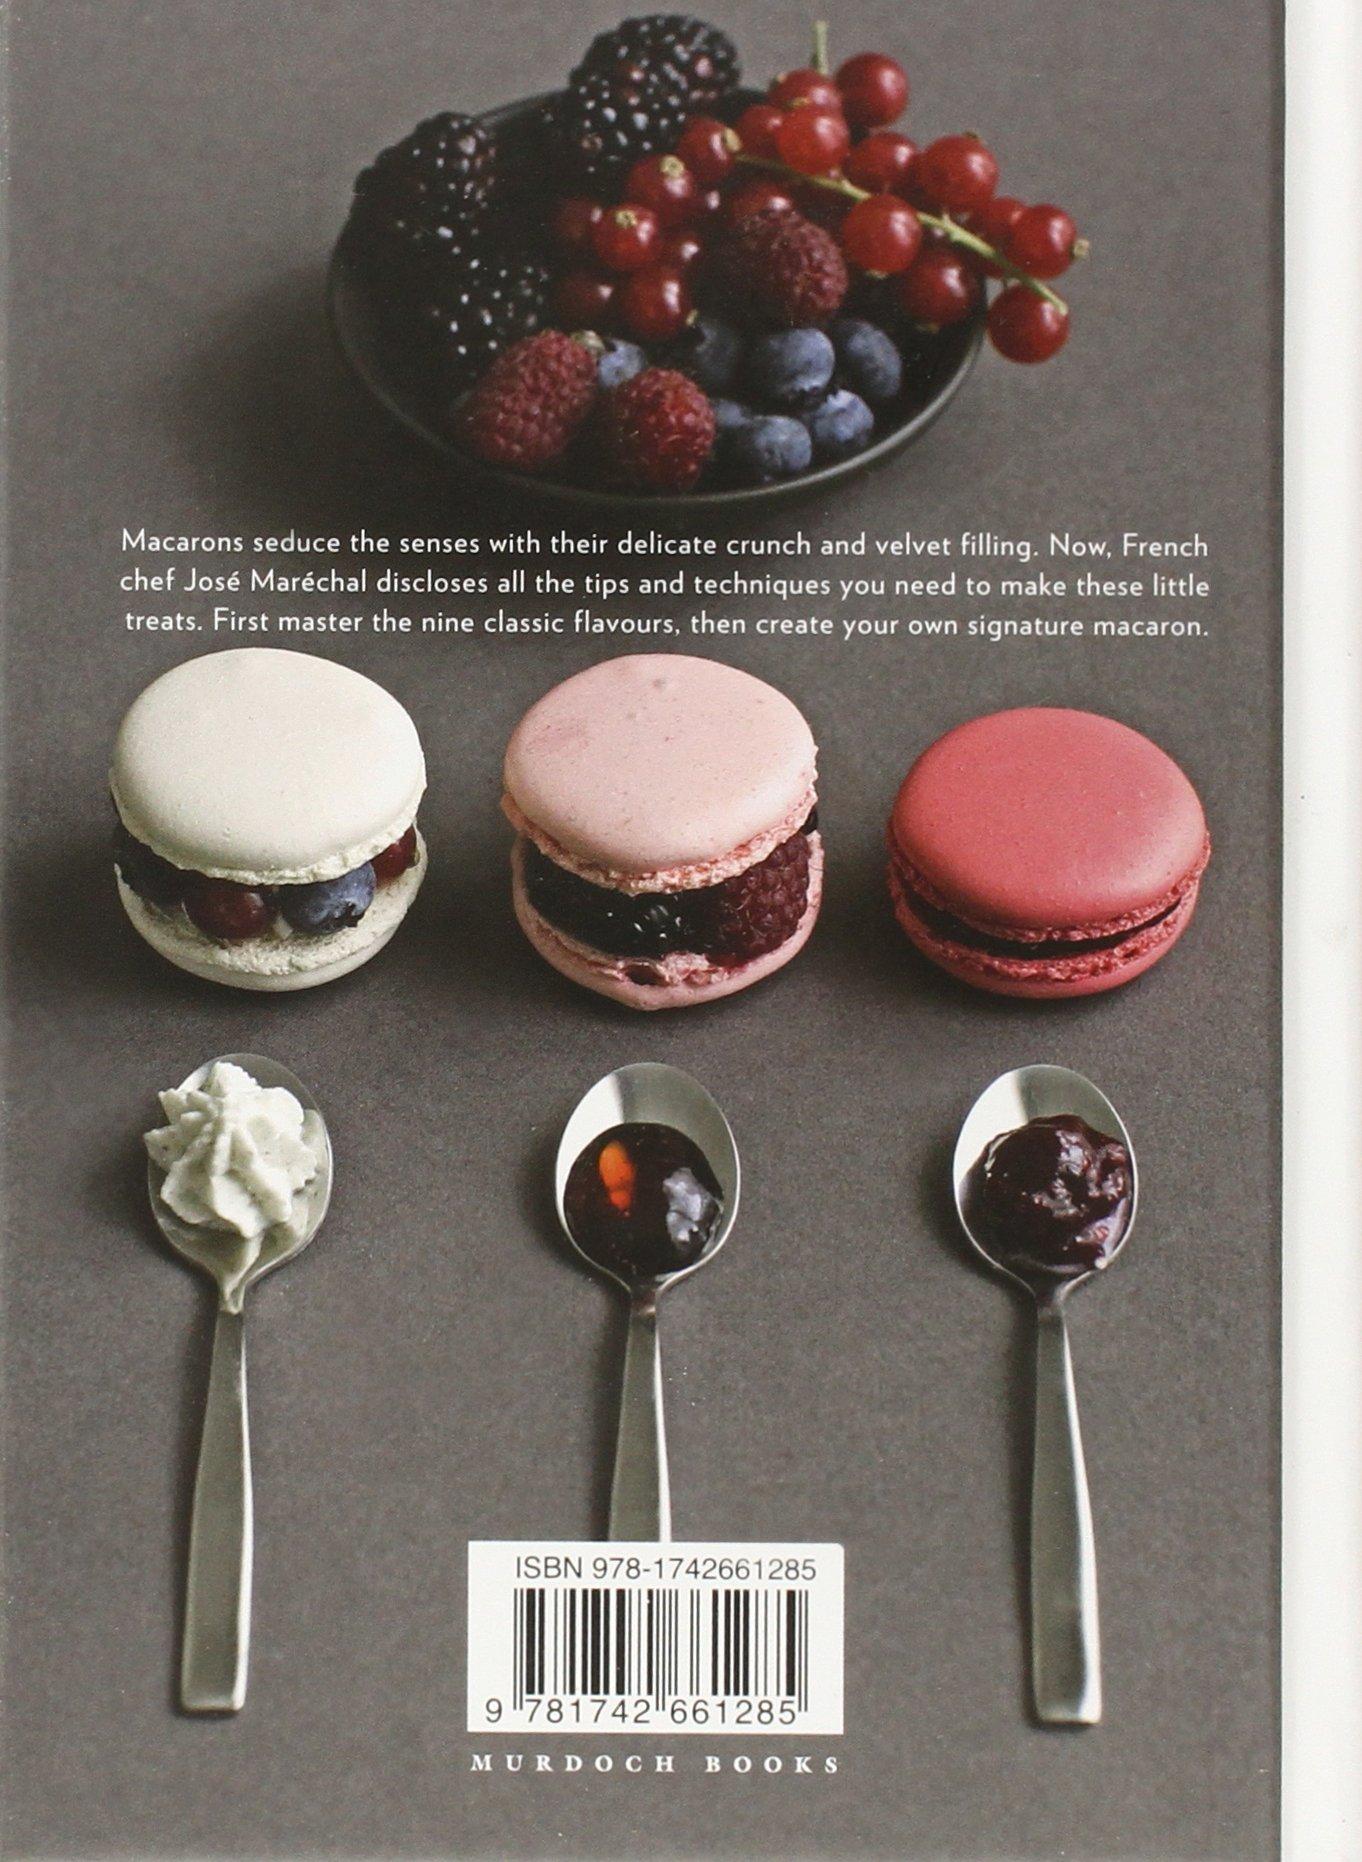 Macaron Secrets: